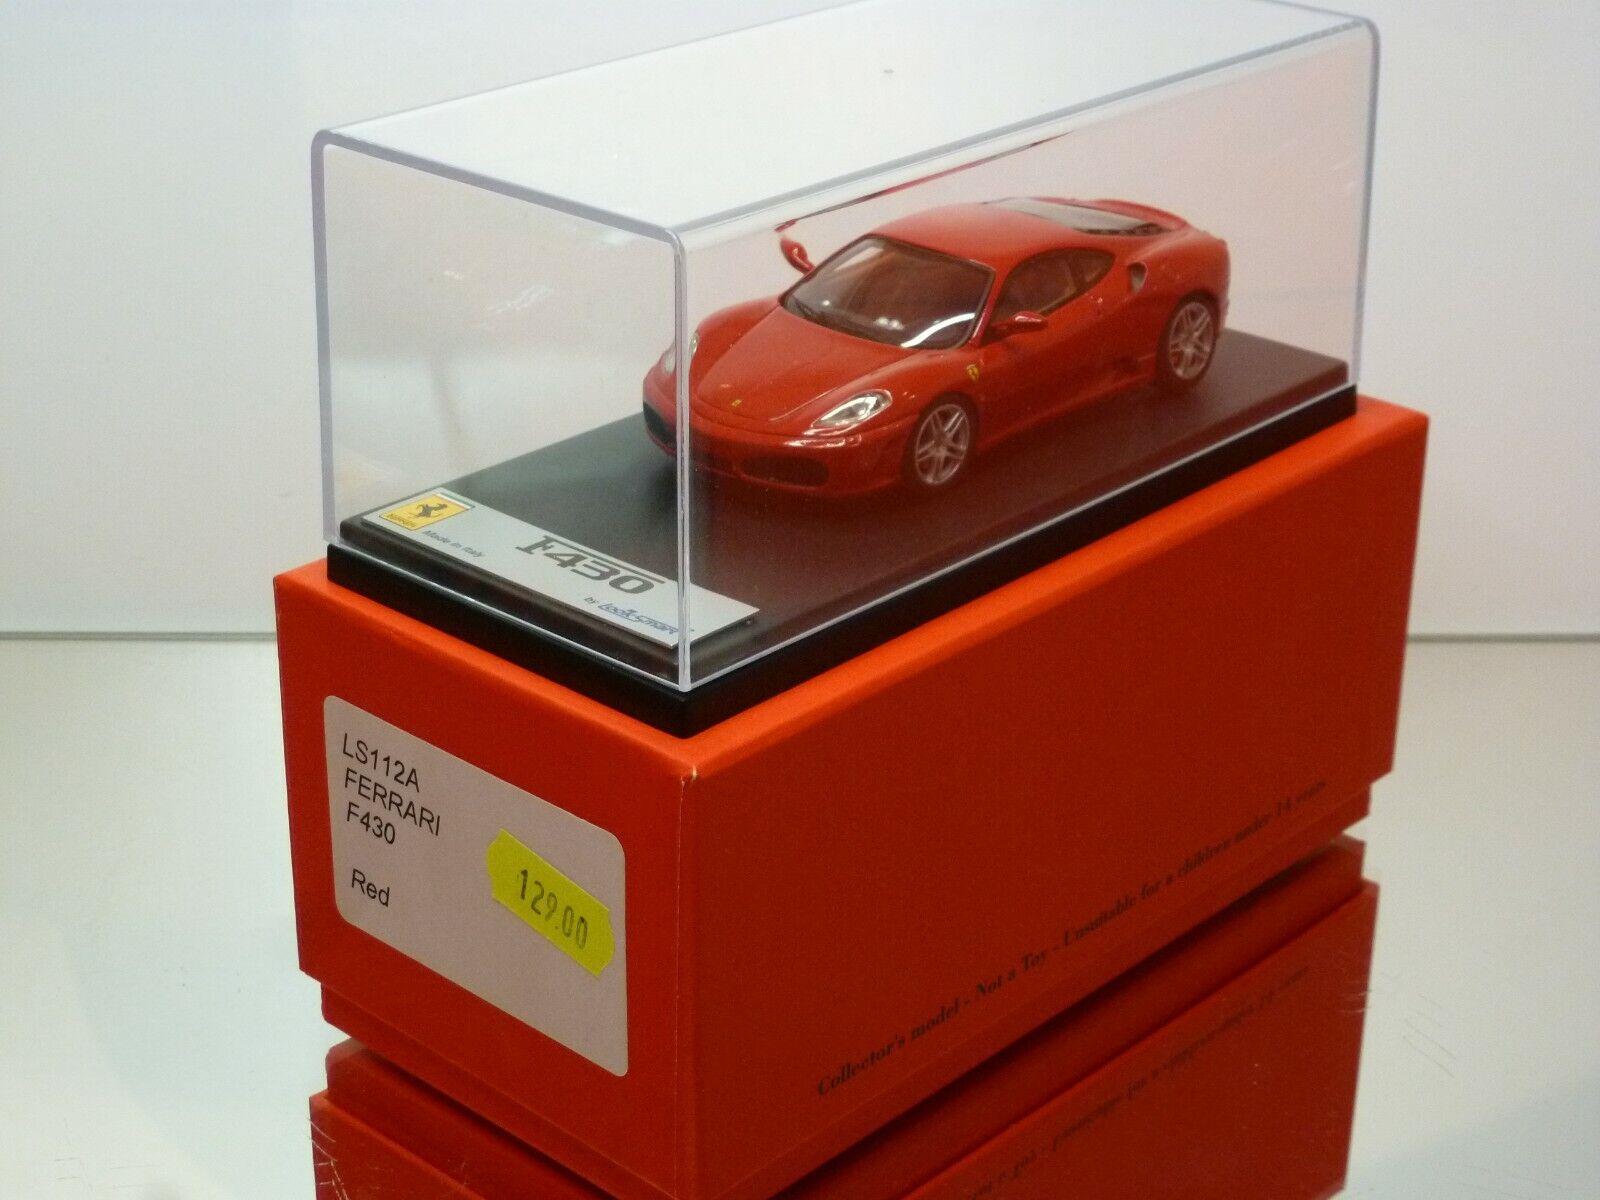 LOOKSMART LS112A FERRARI F430 - rouge 1 43 - EXCELLENT IN BOX